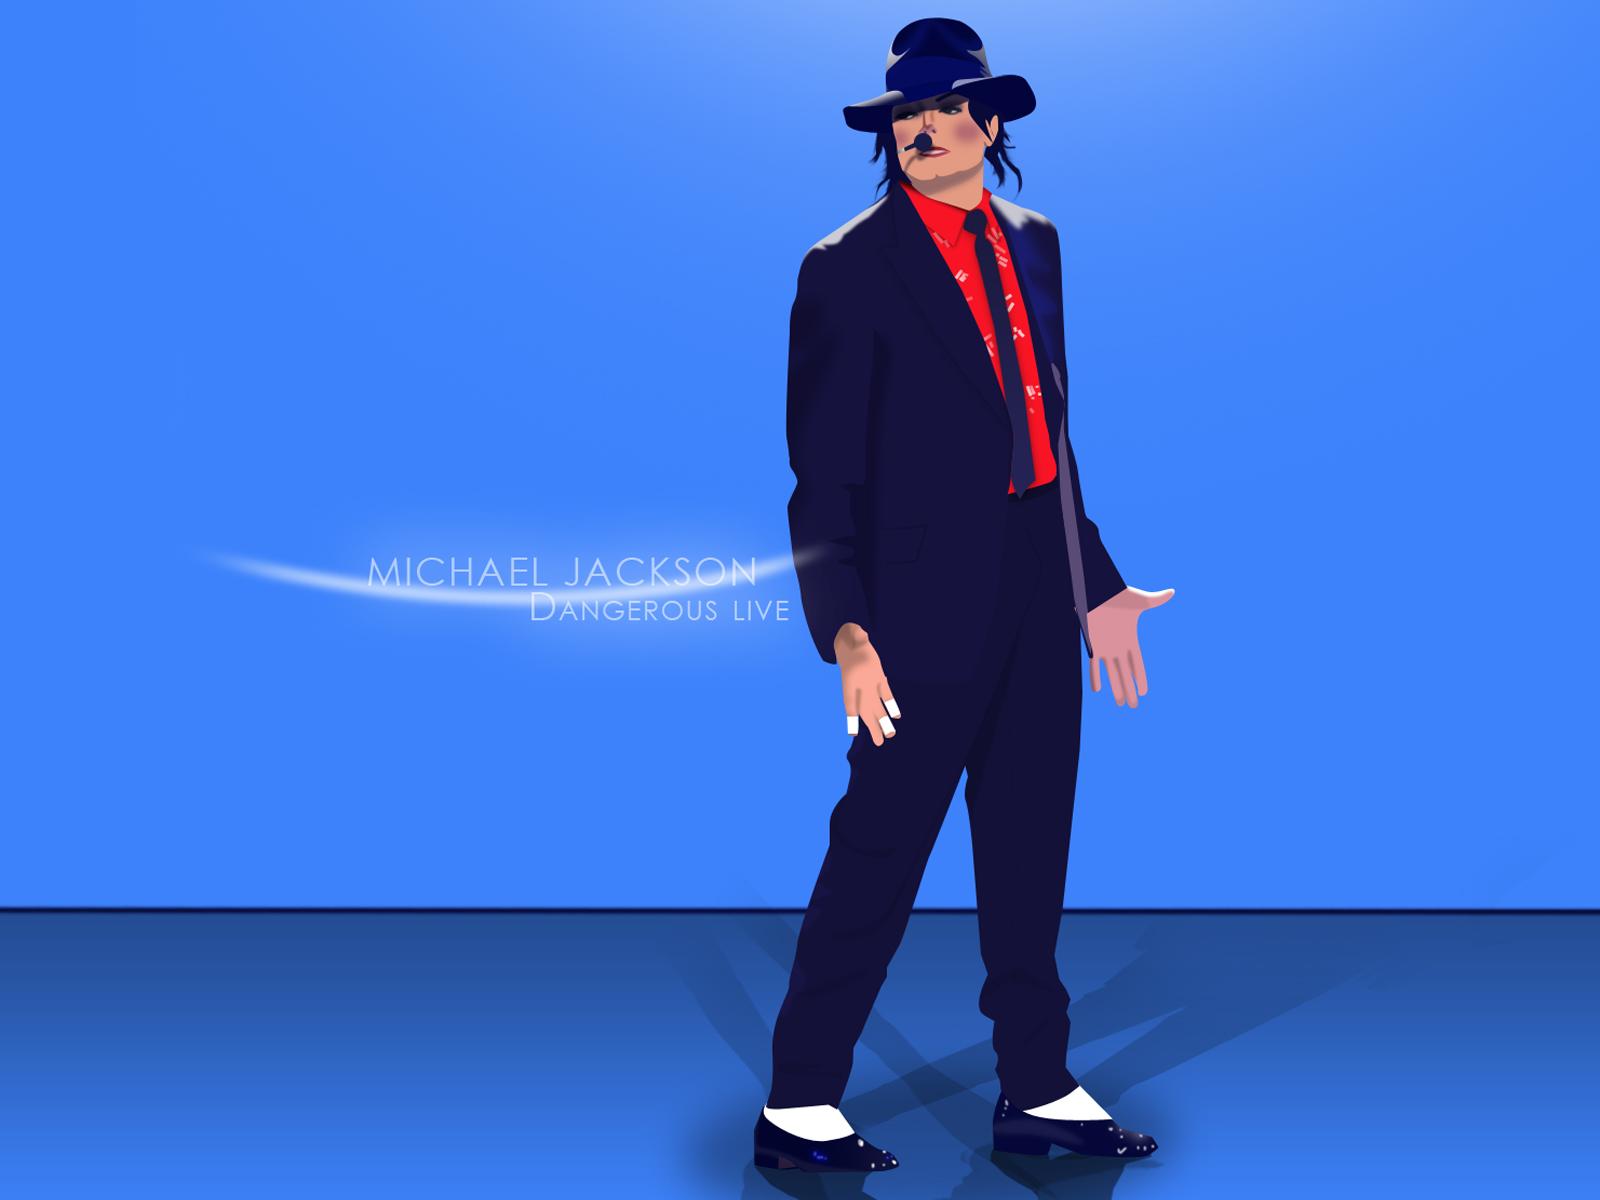 Michael Jackson Dangerous Live Wallpapers | HD Wallpapers